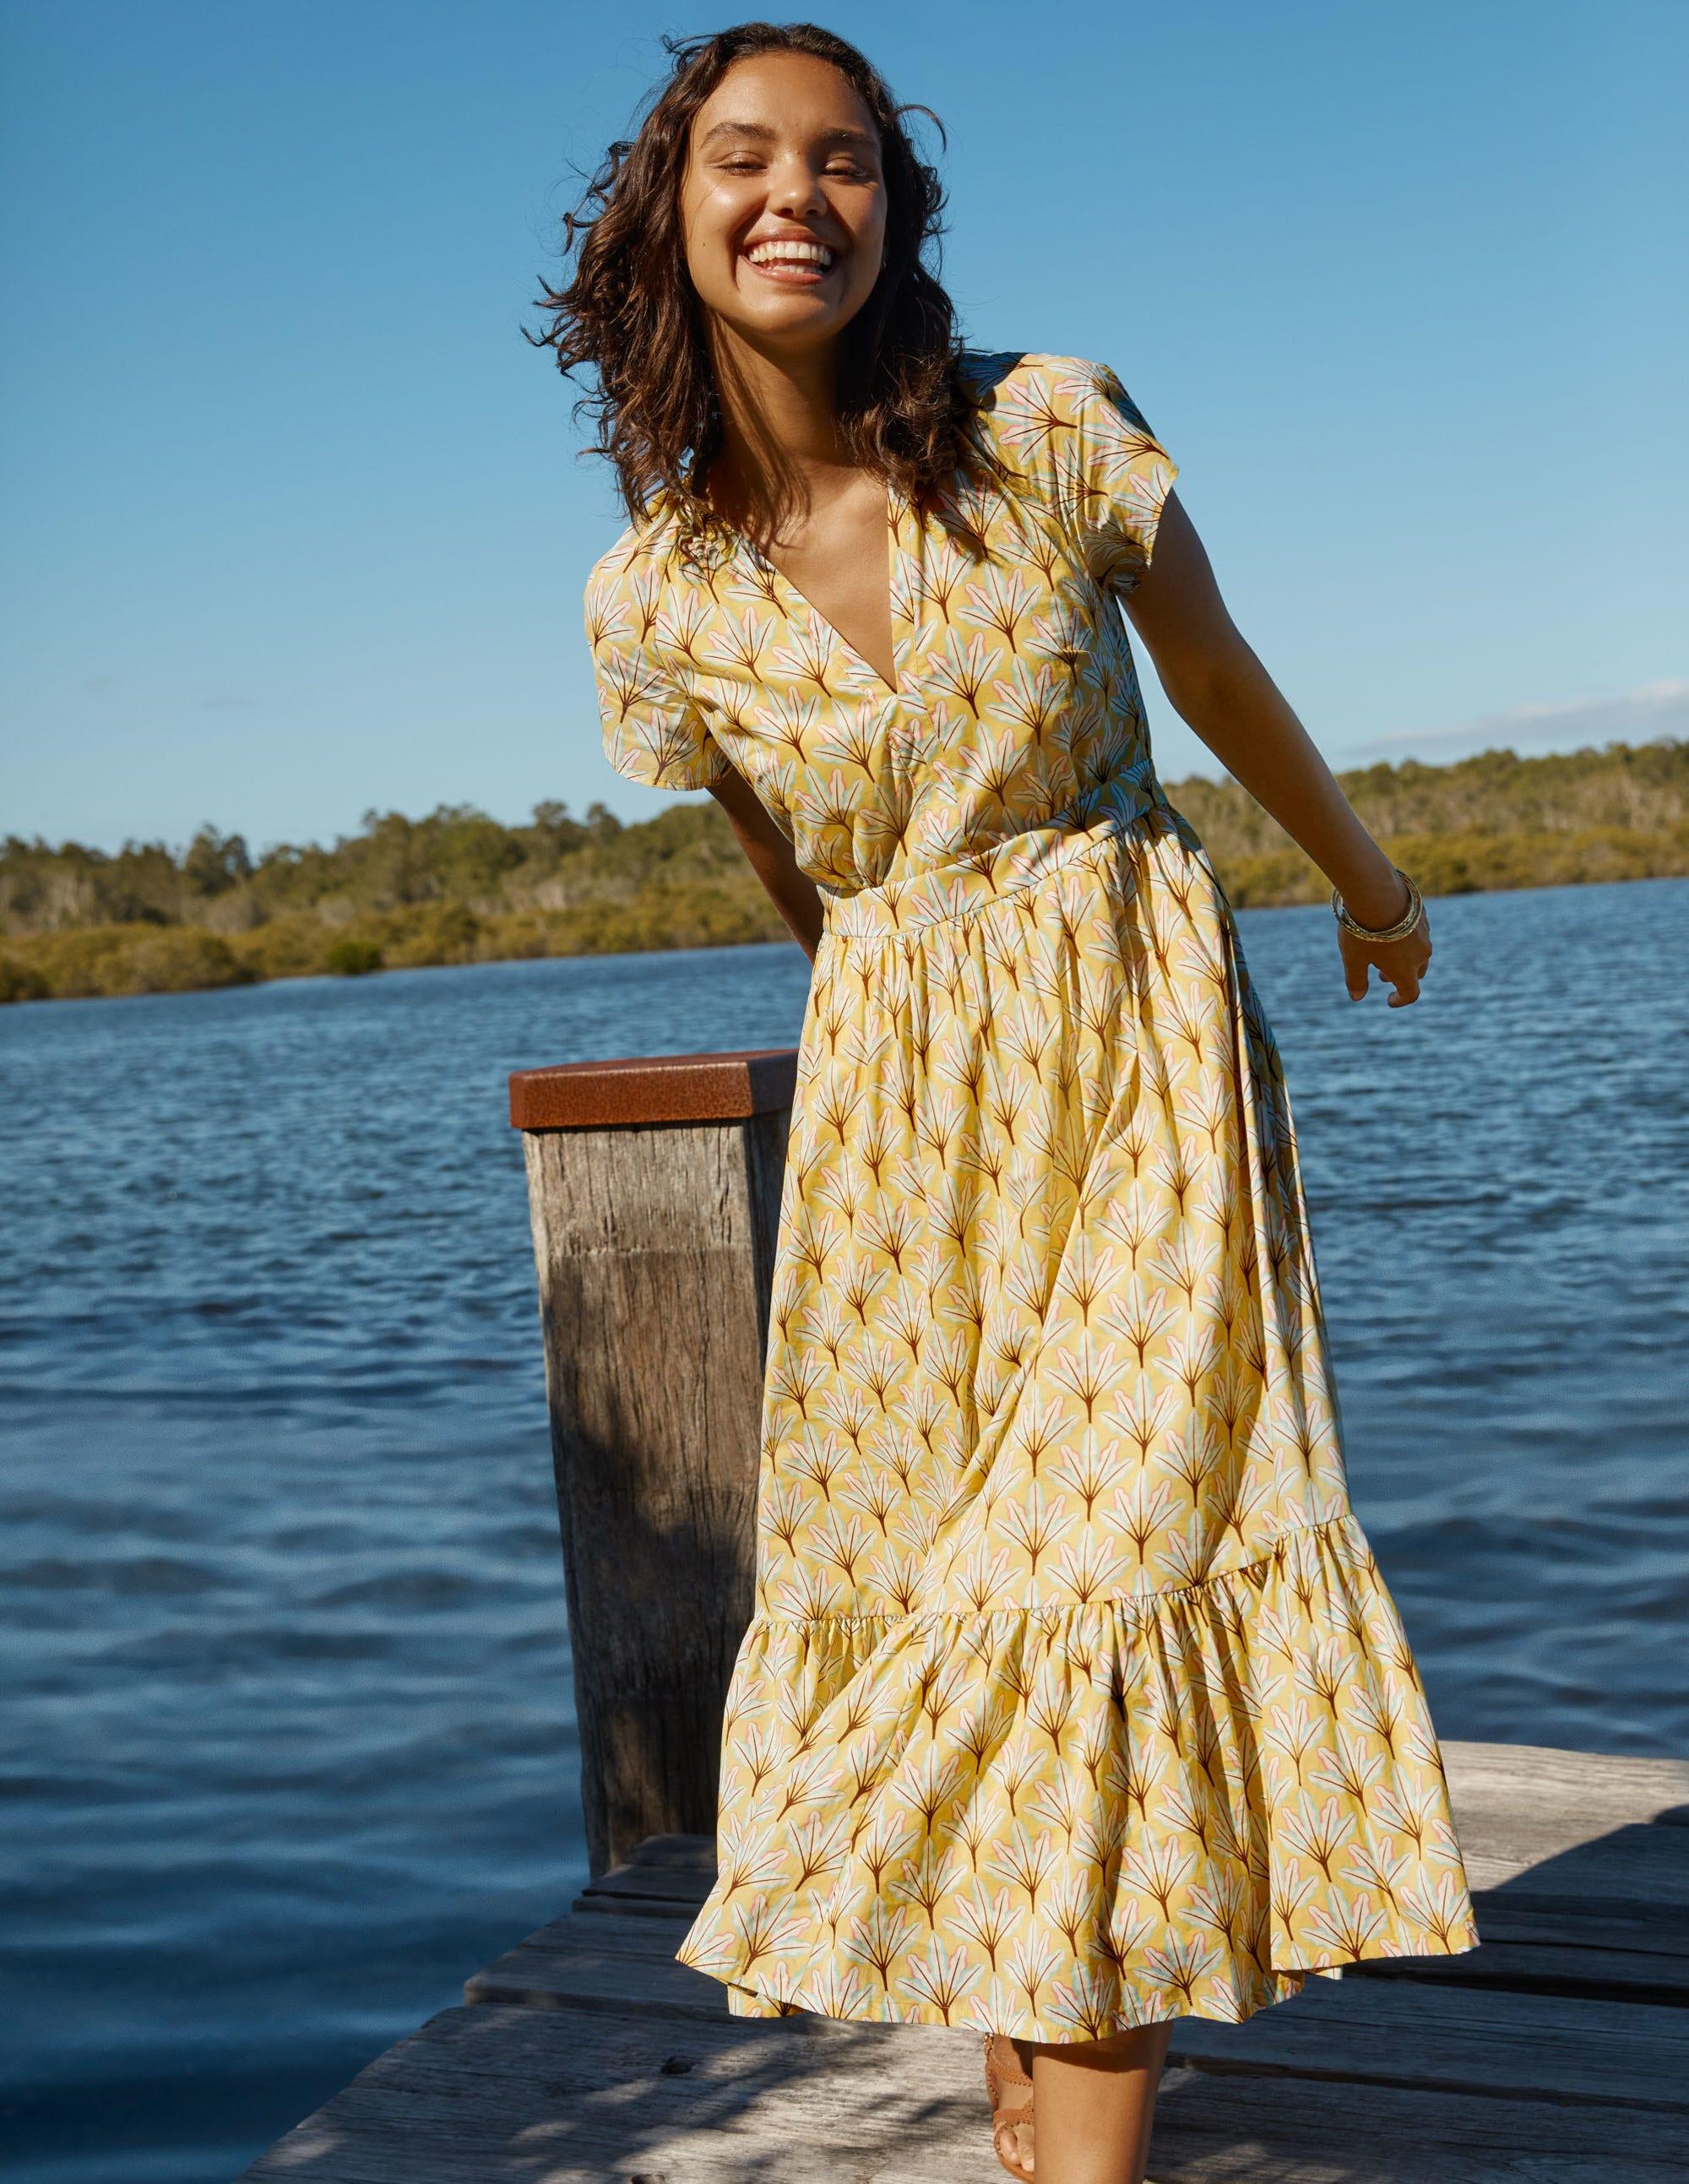 Boden Bernadette Cotton Midi Dress - Corn Yellow, Intricate Leaf